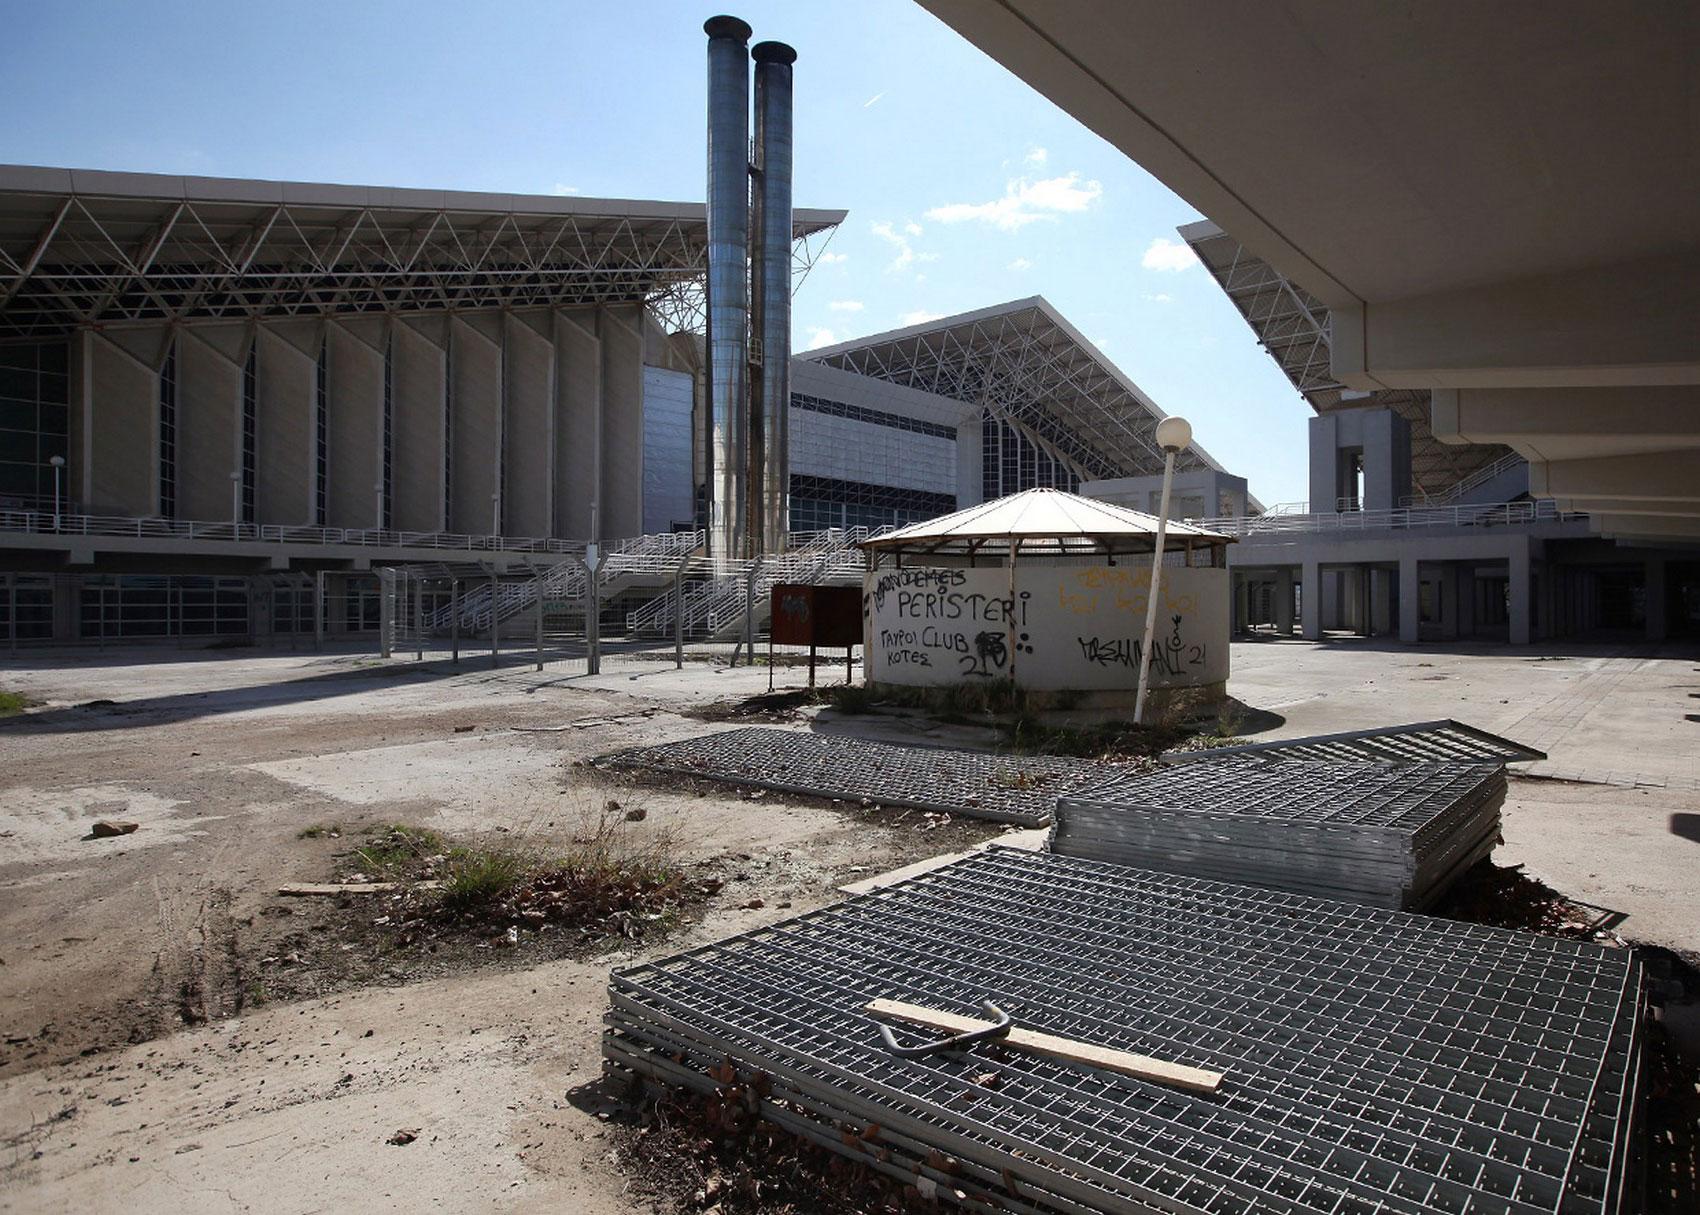 олимпийский спортивный комплекс, фото